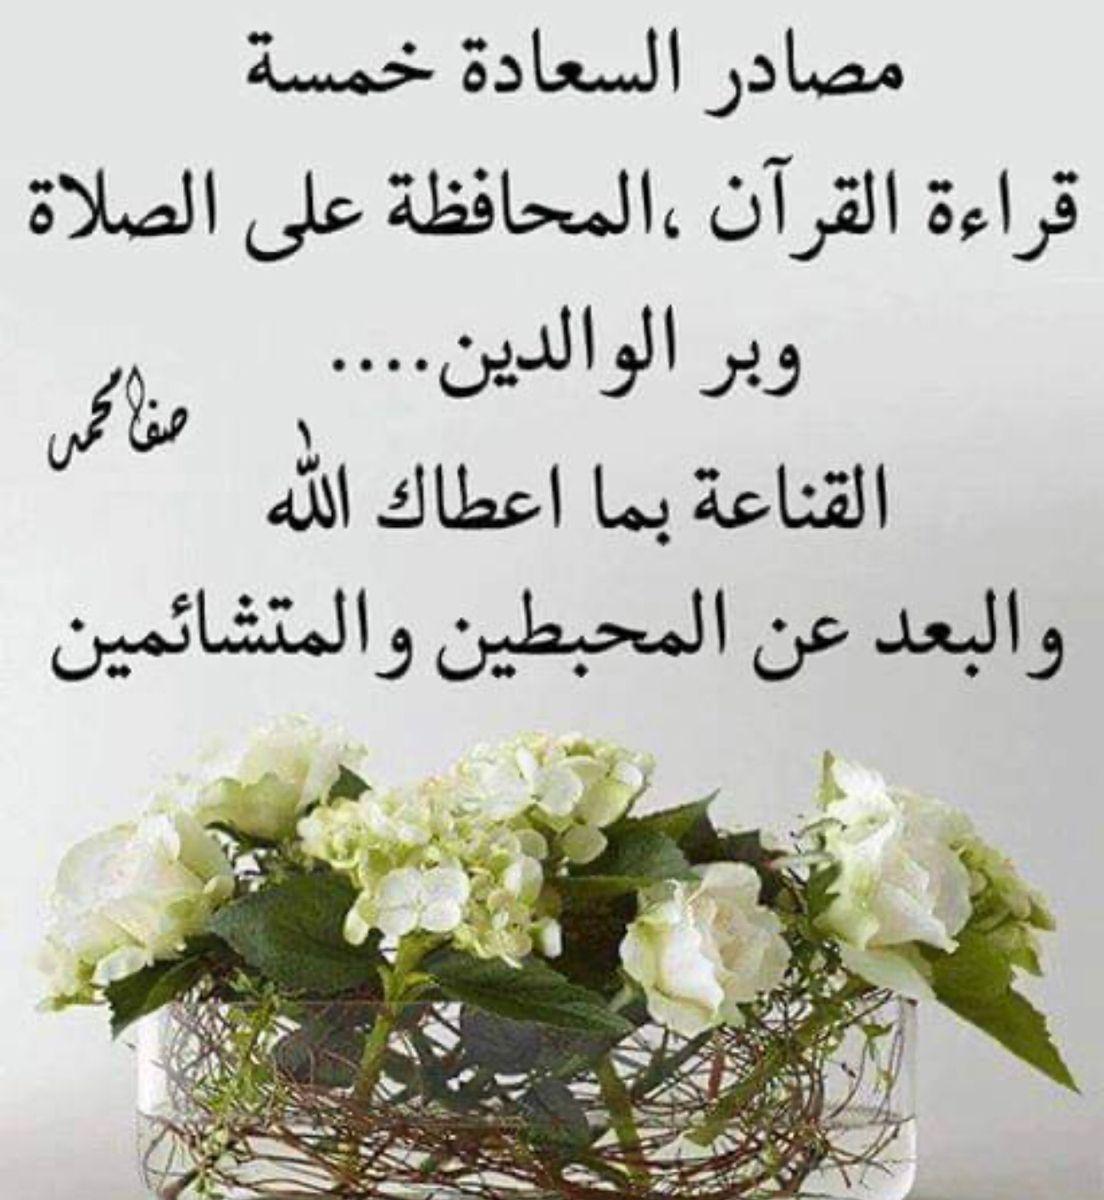 Pin By Ummohamed On اسماء الله الحسنى Home Decor Decals Home Decor Decor